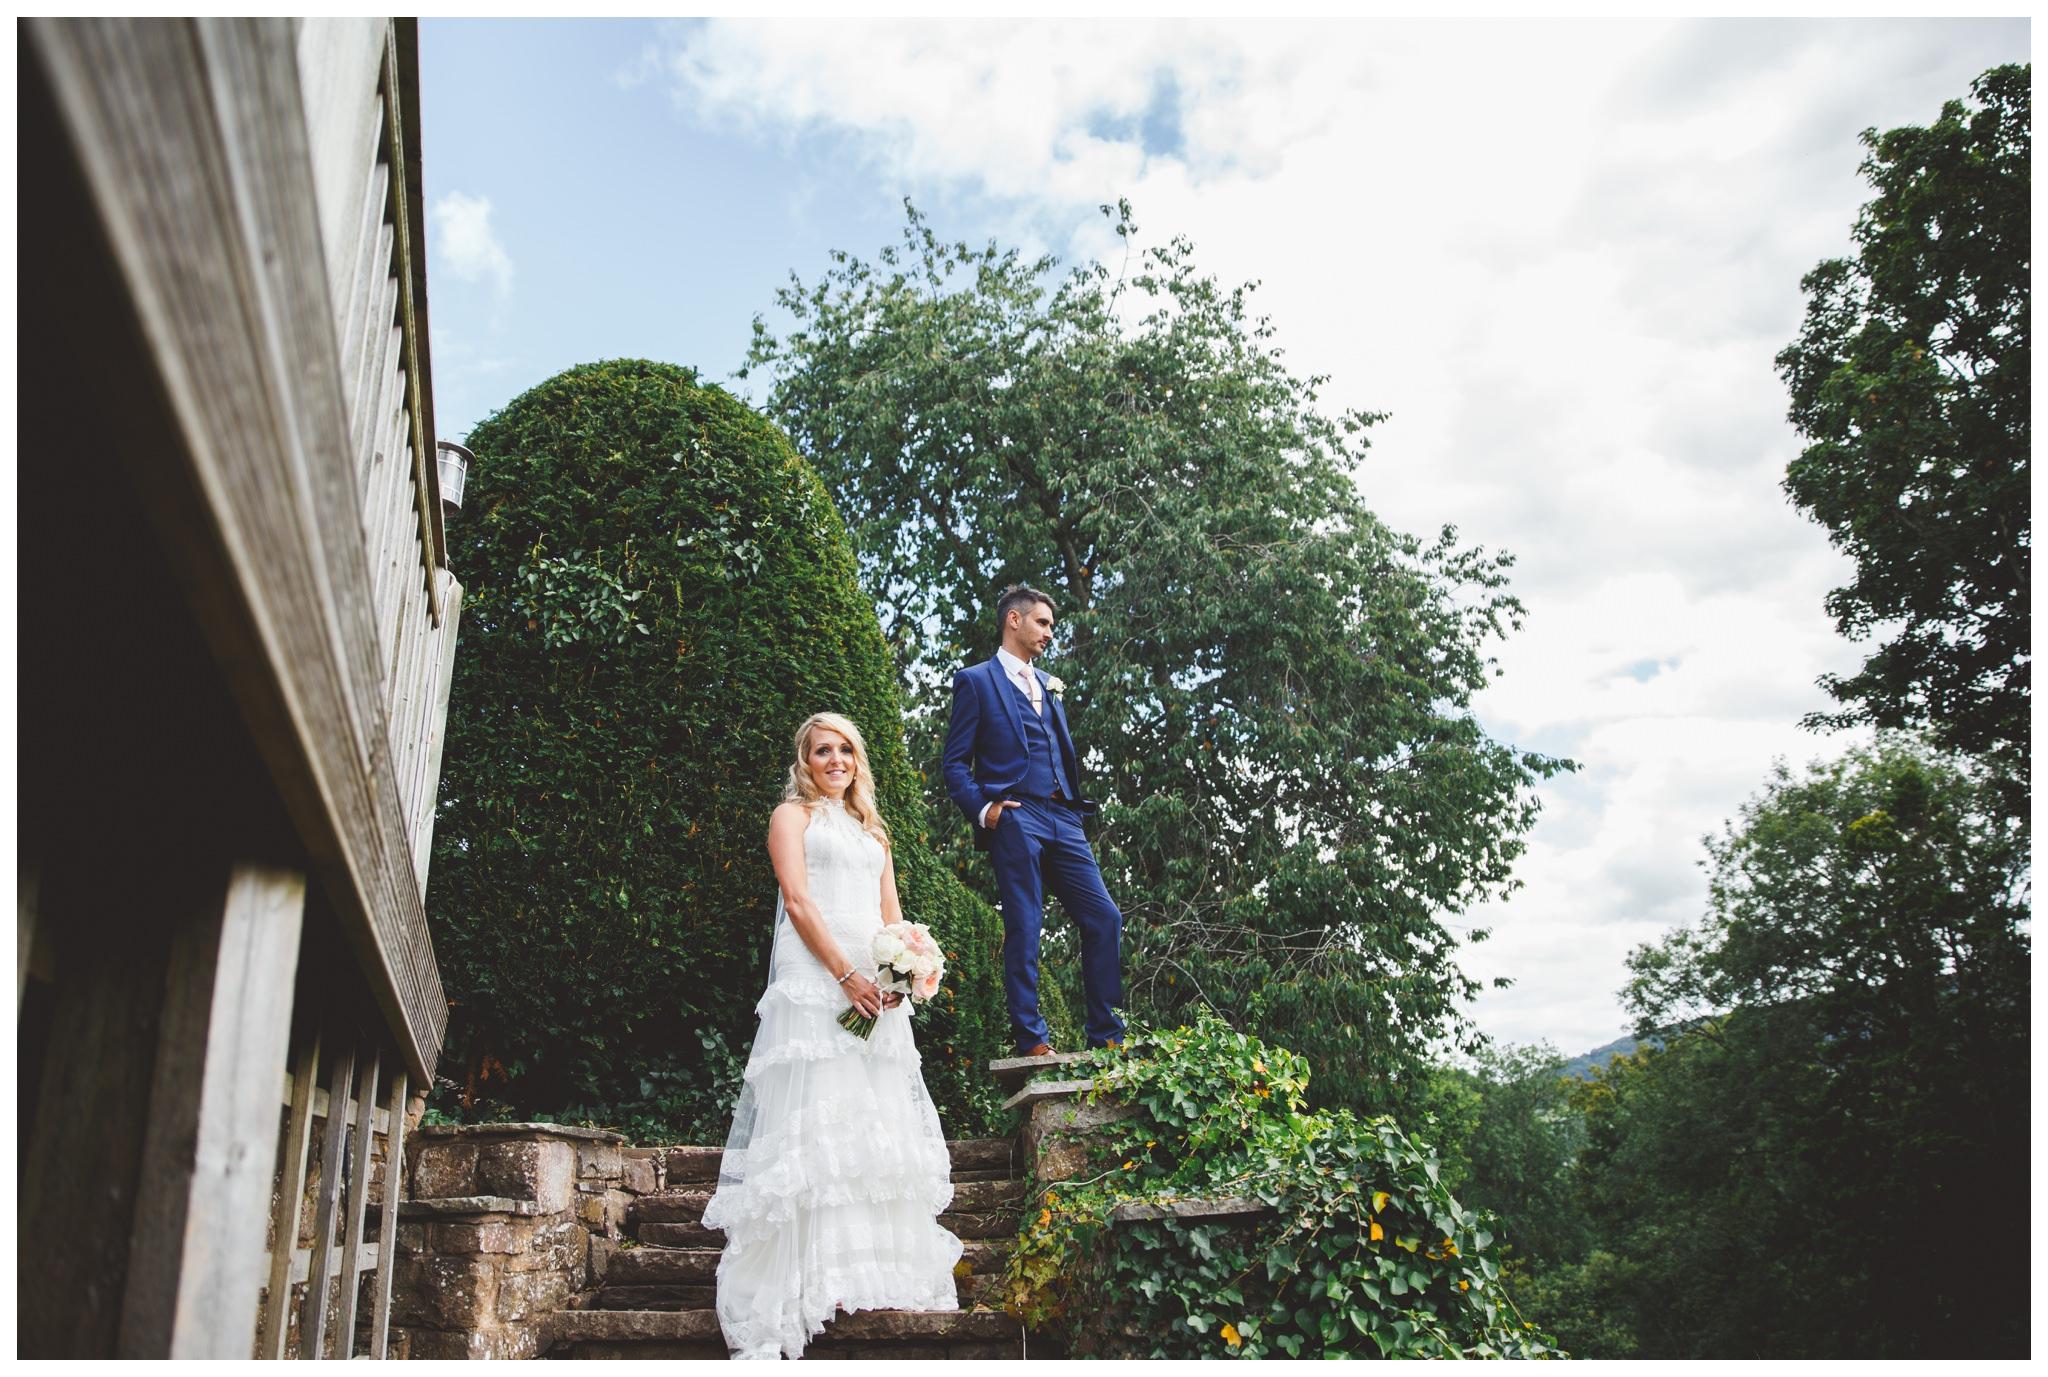 Richard Savage Photography - Wedding - Peterstone Court Brecon - 2016-05-11_0042